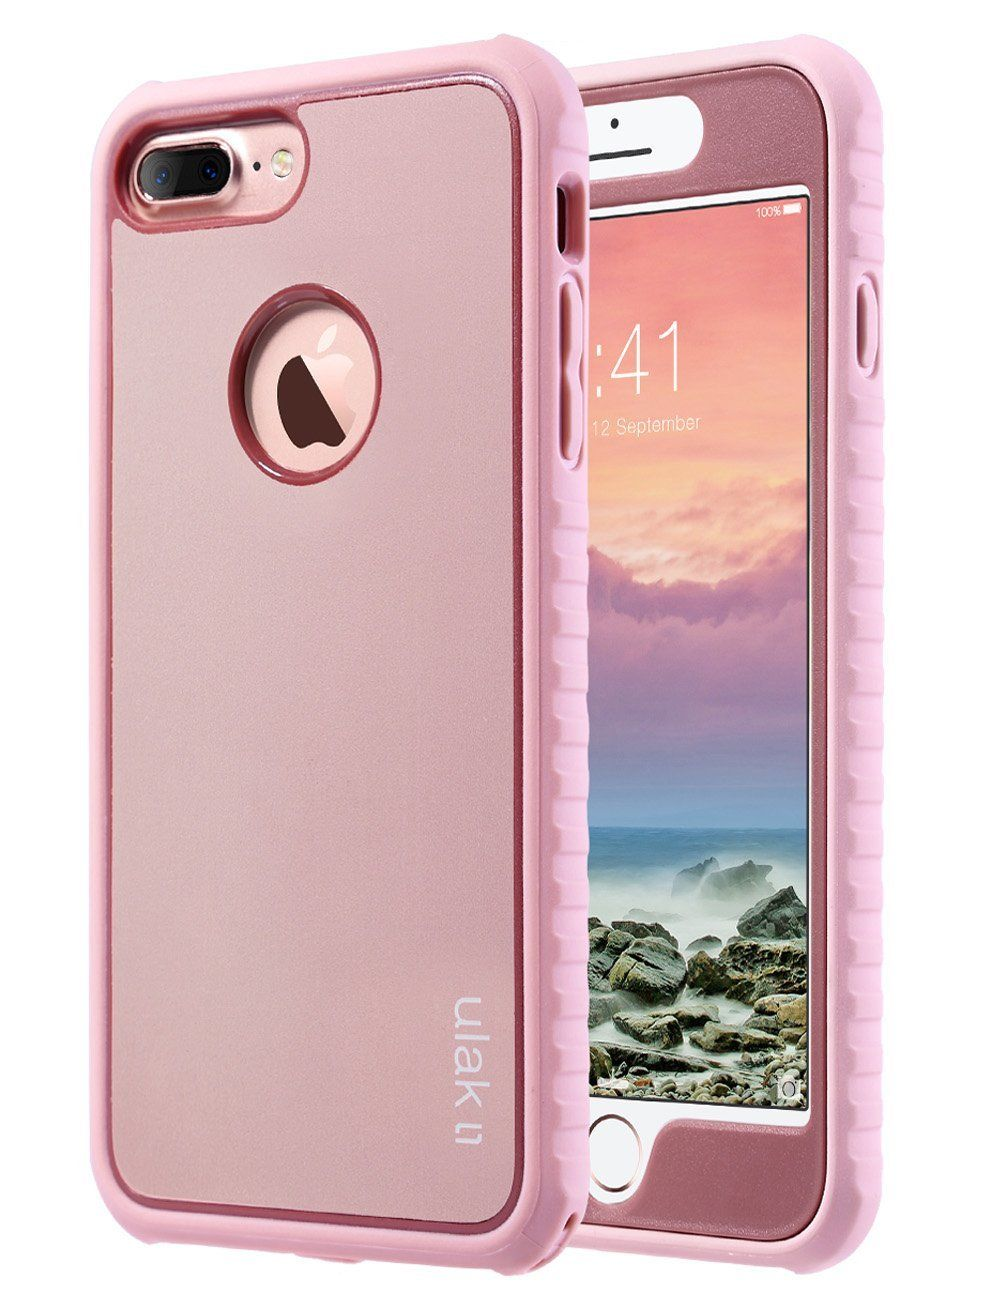 low priced 0906e 65ca7 Amazon.com: iPhone 8 Plus Case, iPhone 7 Plus Case, ULAK Shockproof ...